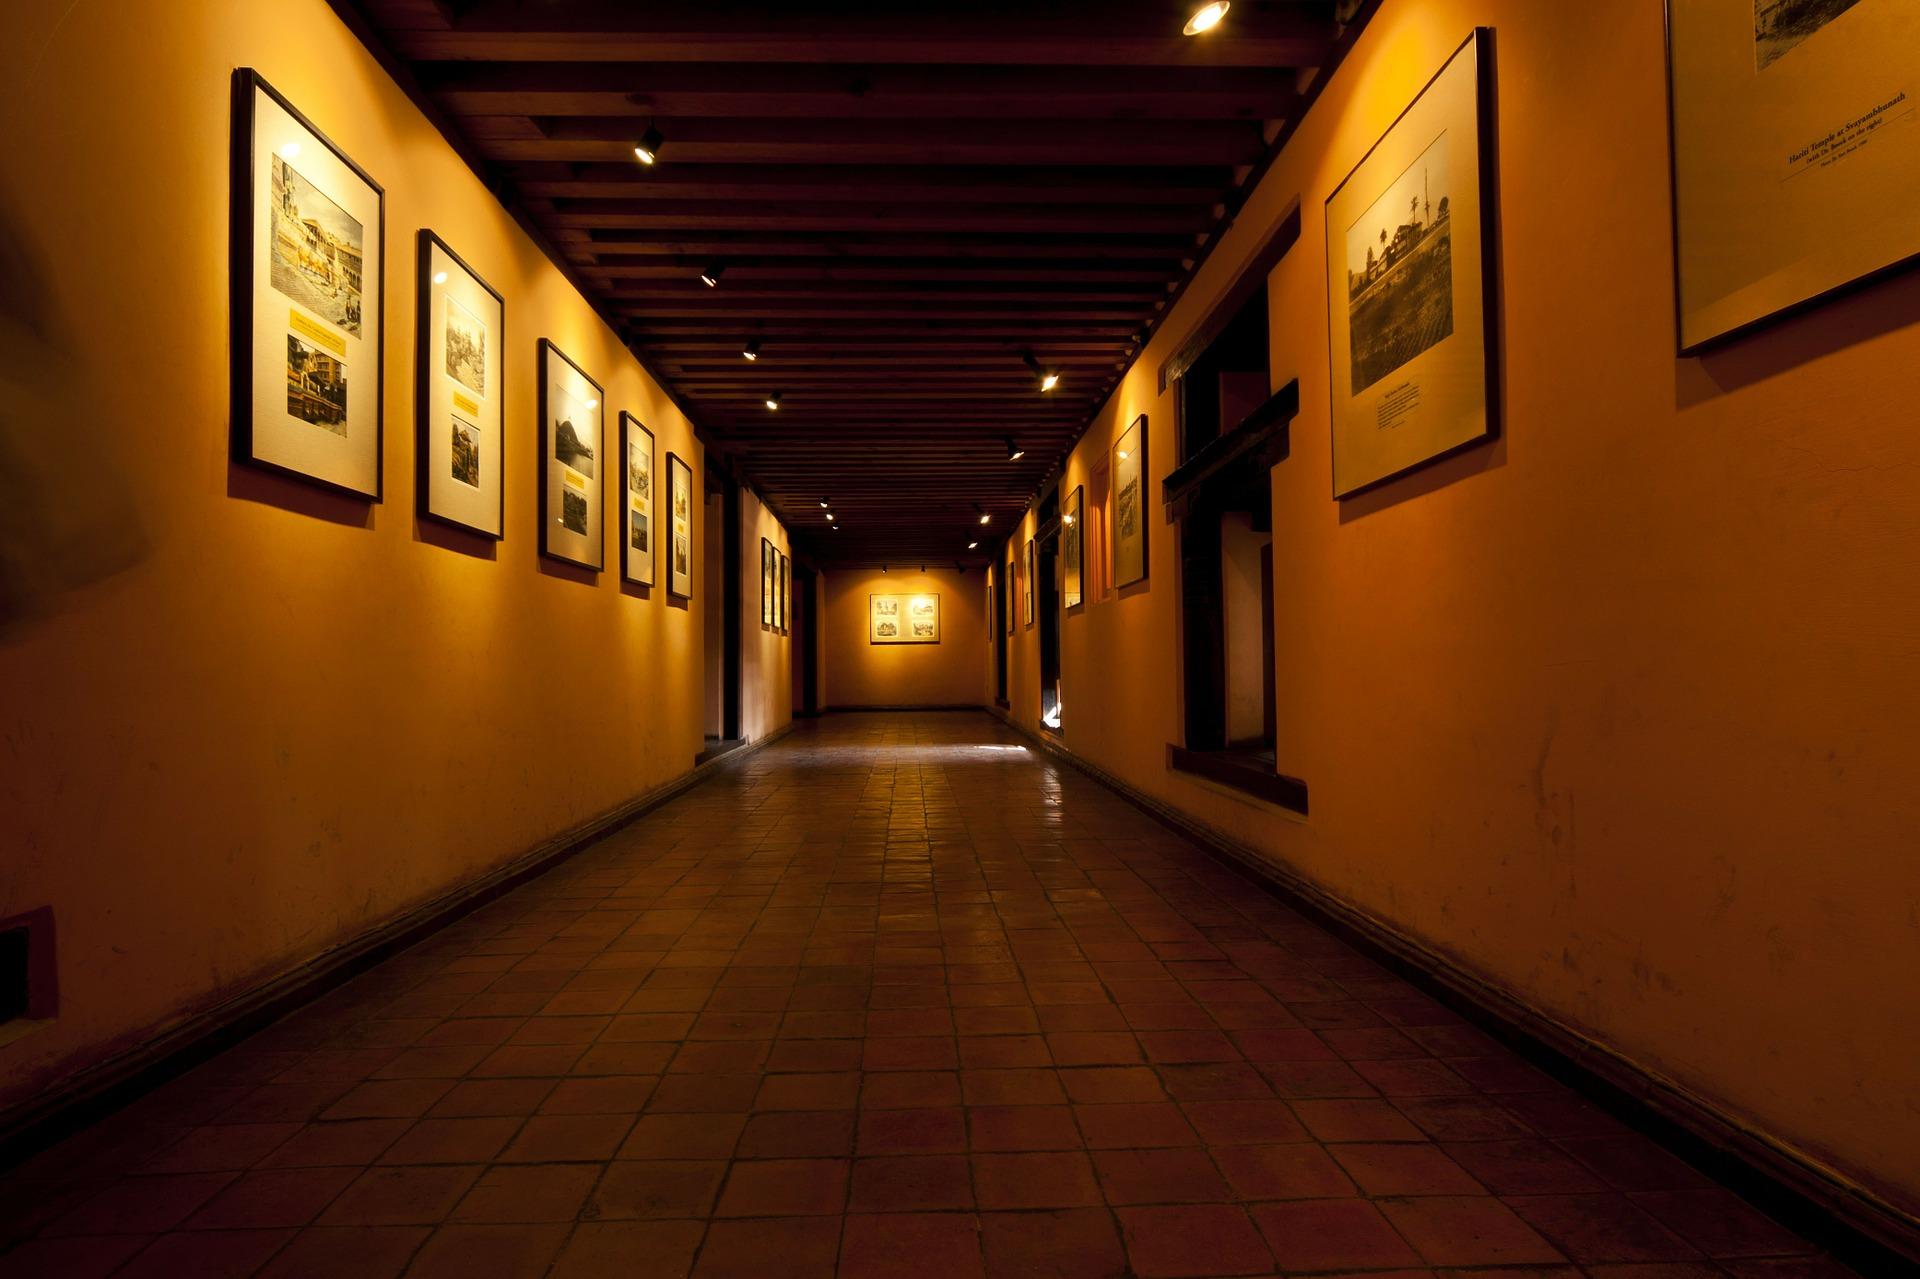 museum-100933_1920_1555534522598.jpg